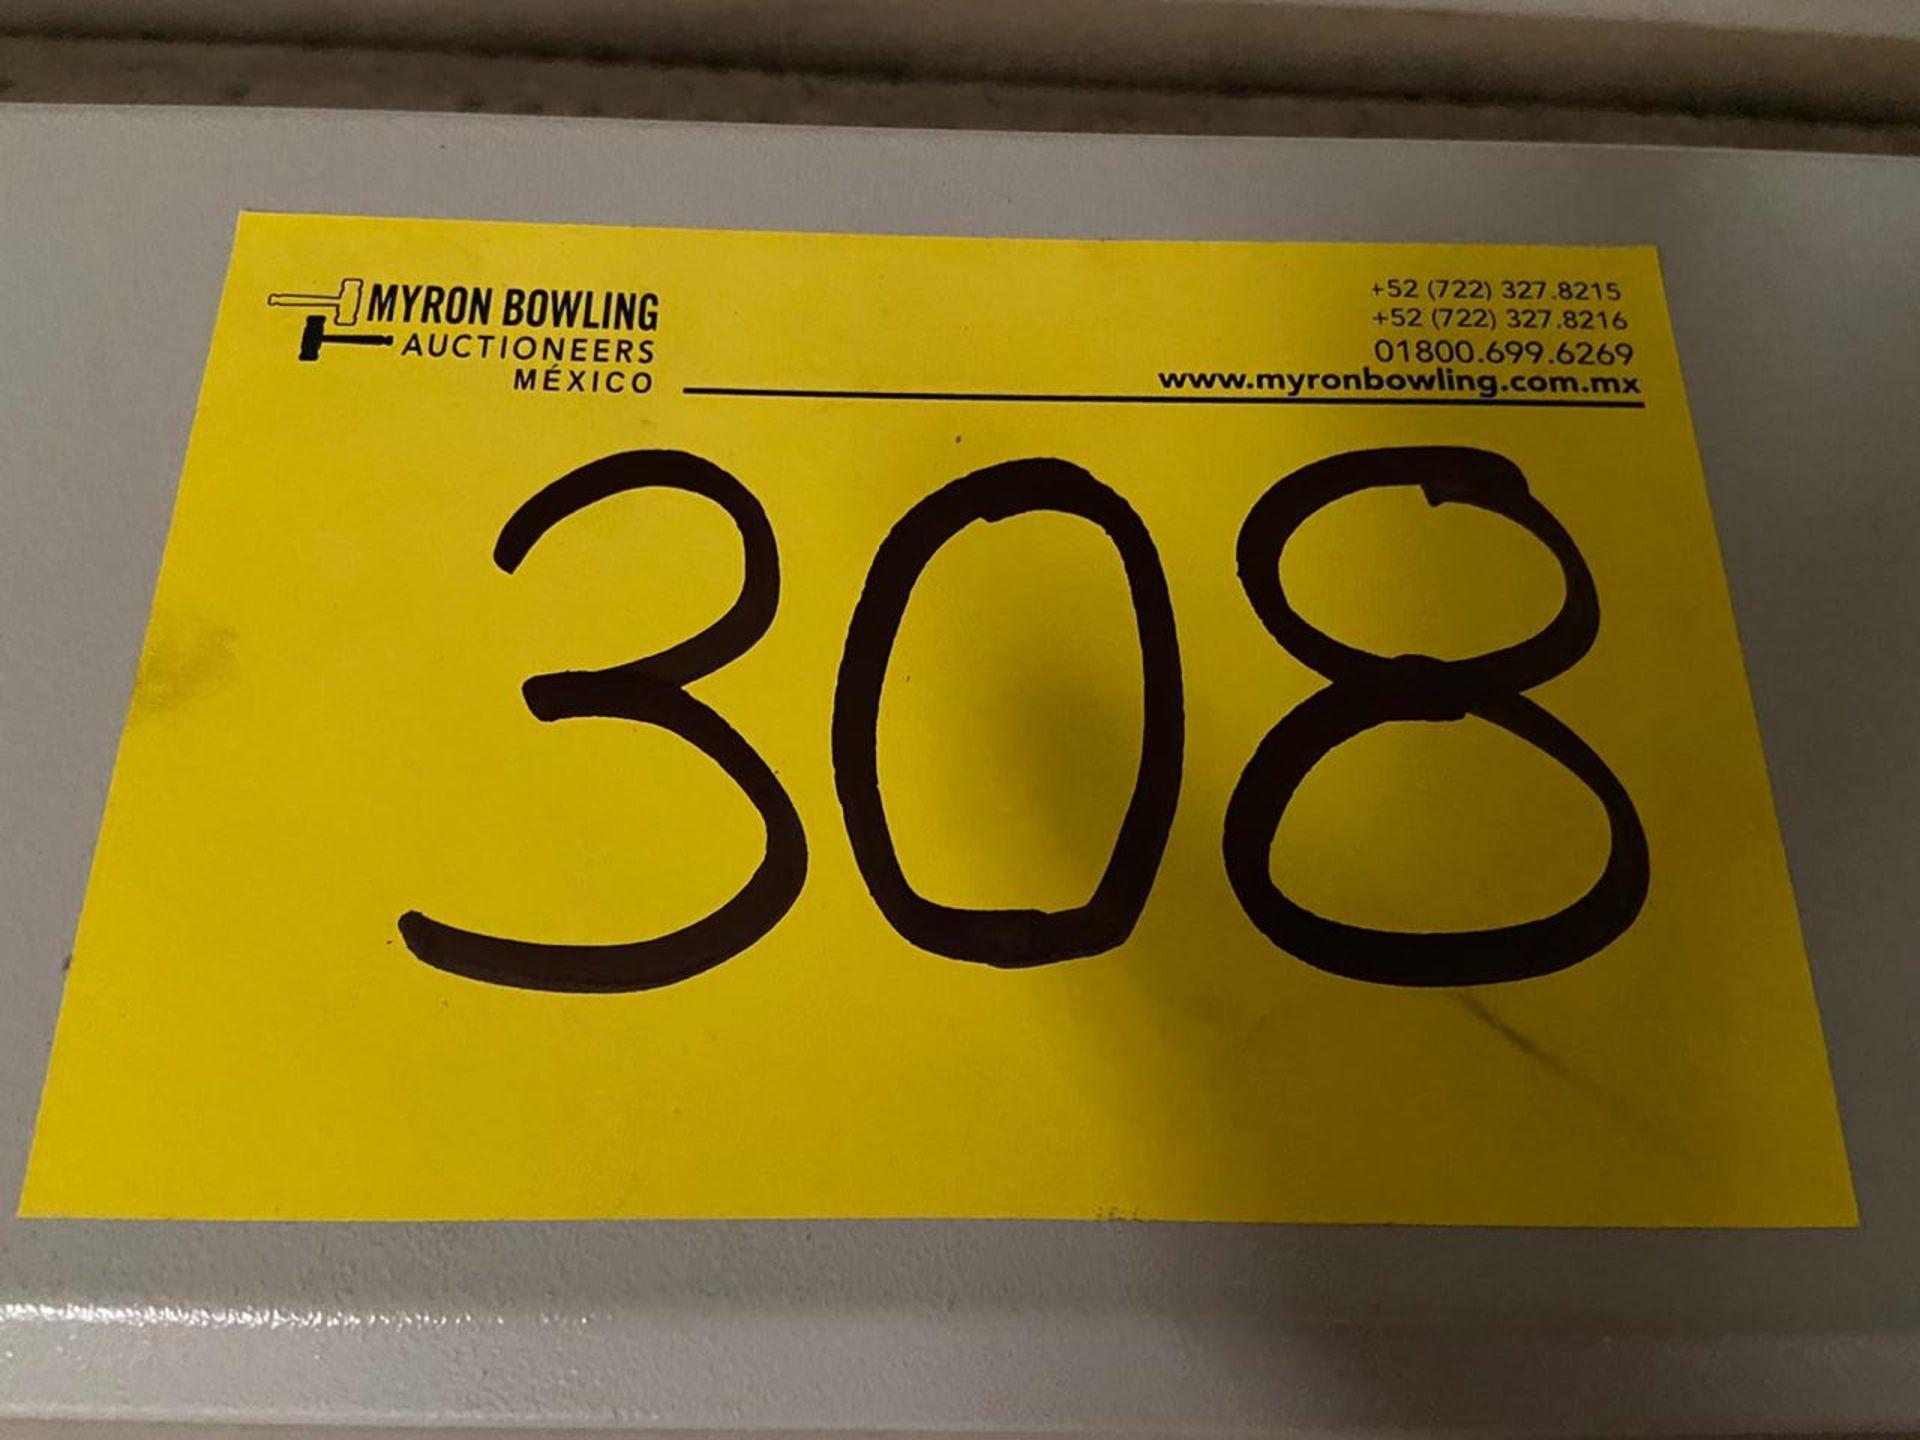 Lot 308 - Cortador digital tipo plotter marca ZUND, modelo M-800, Serie: M8.385U